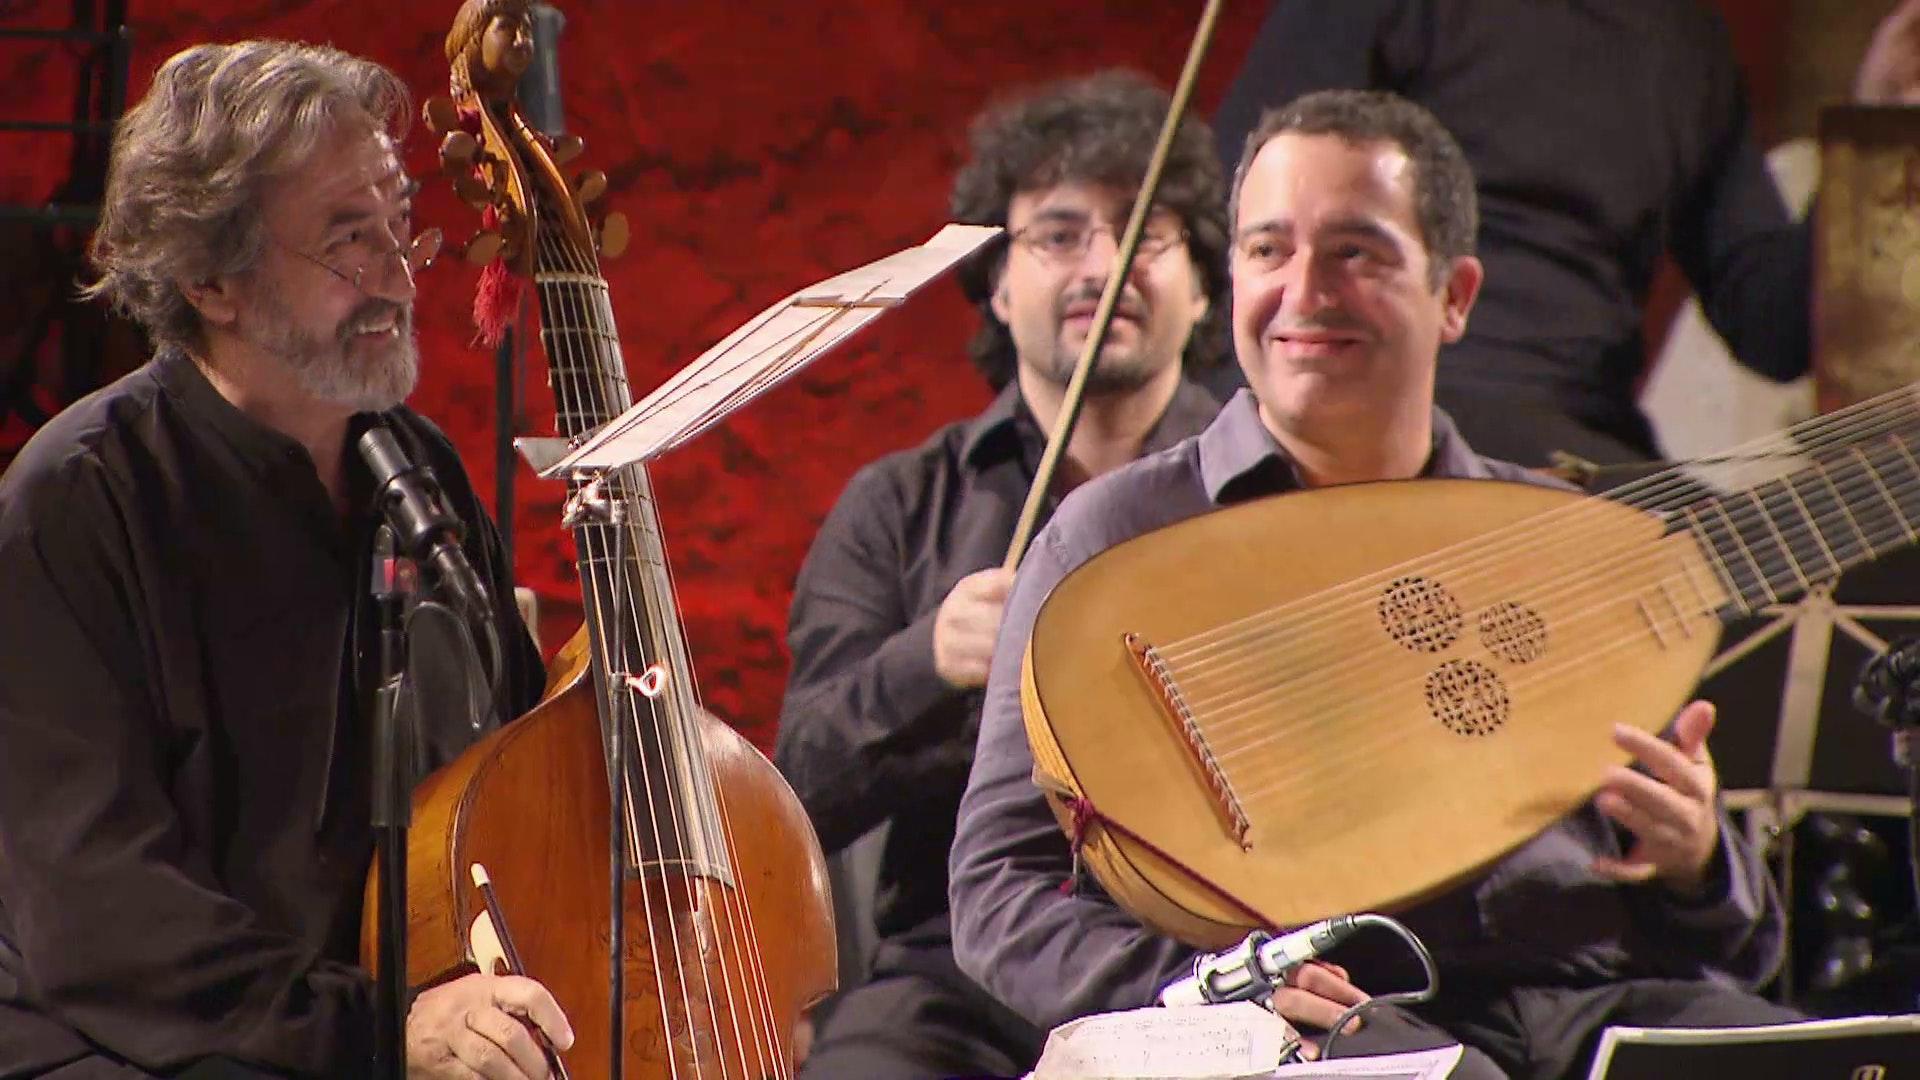 Jordi Savall conducts Corelli, Telemann and Rameau